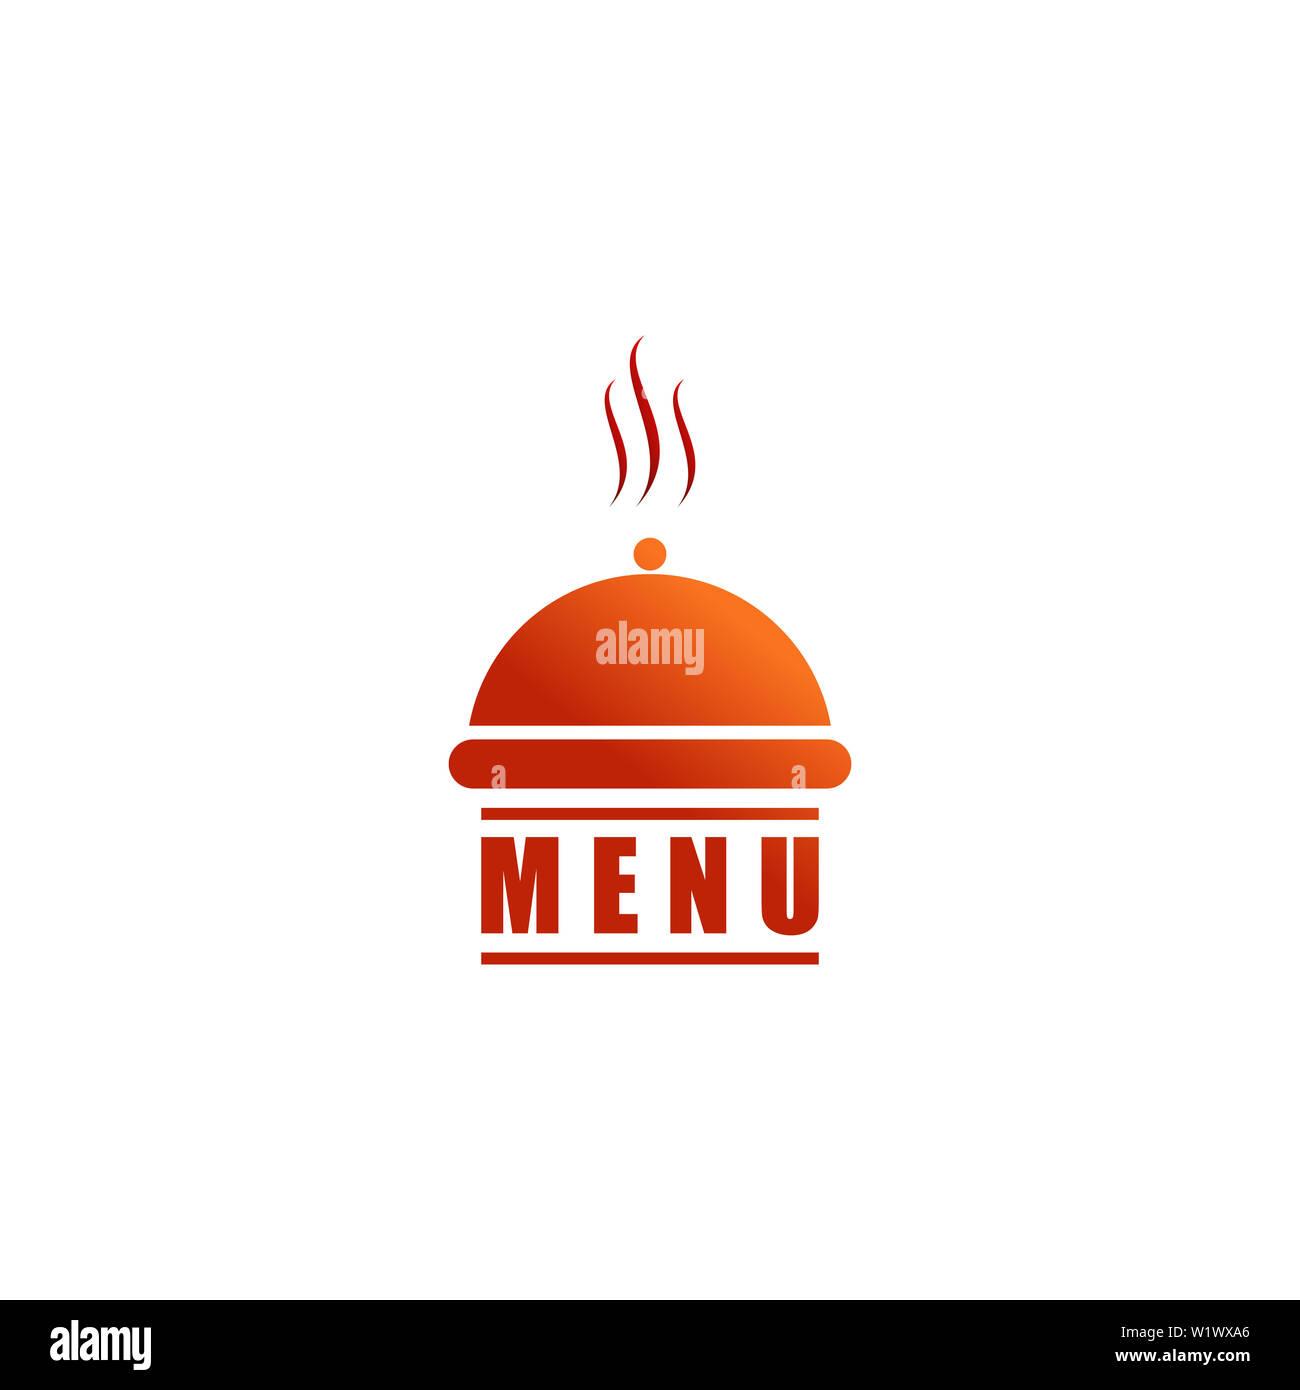 Restaurant Logo Design Vector For Cafe Hotel Or Restaurant Business Stock Photo Alamy